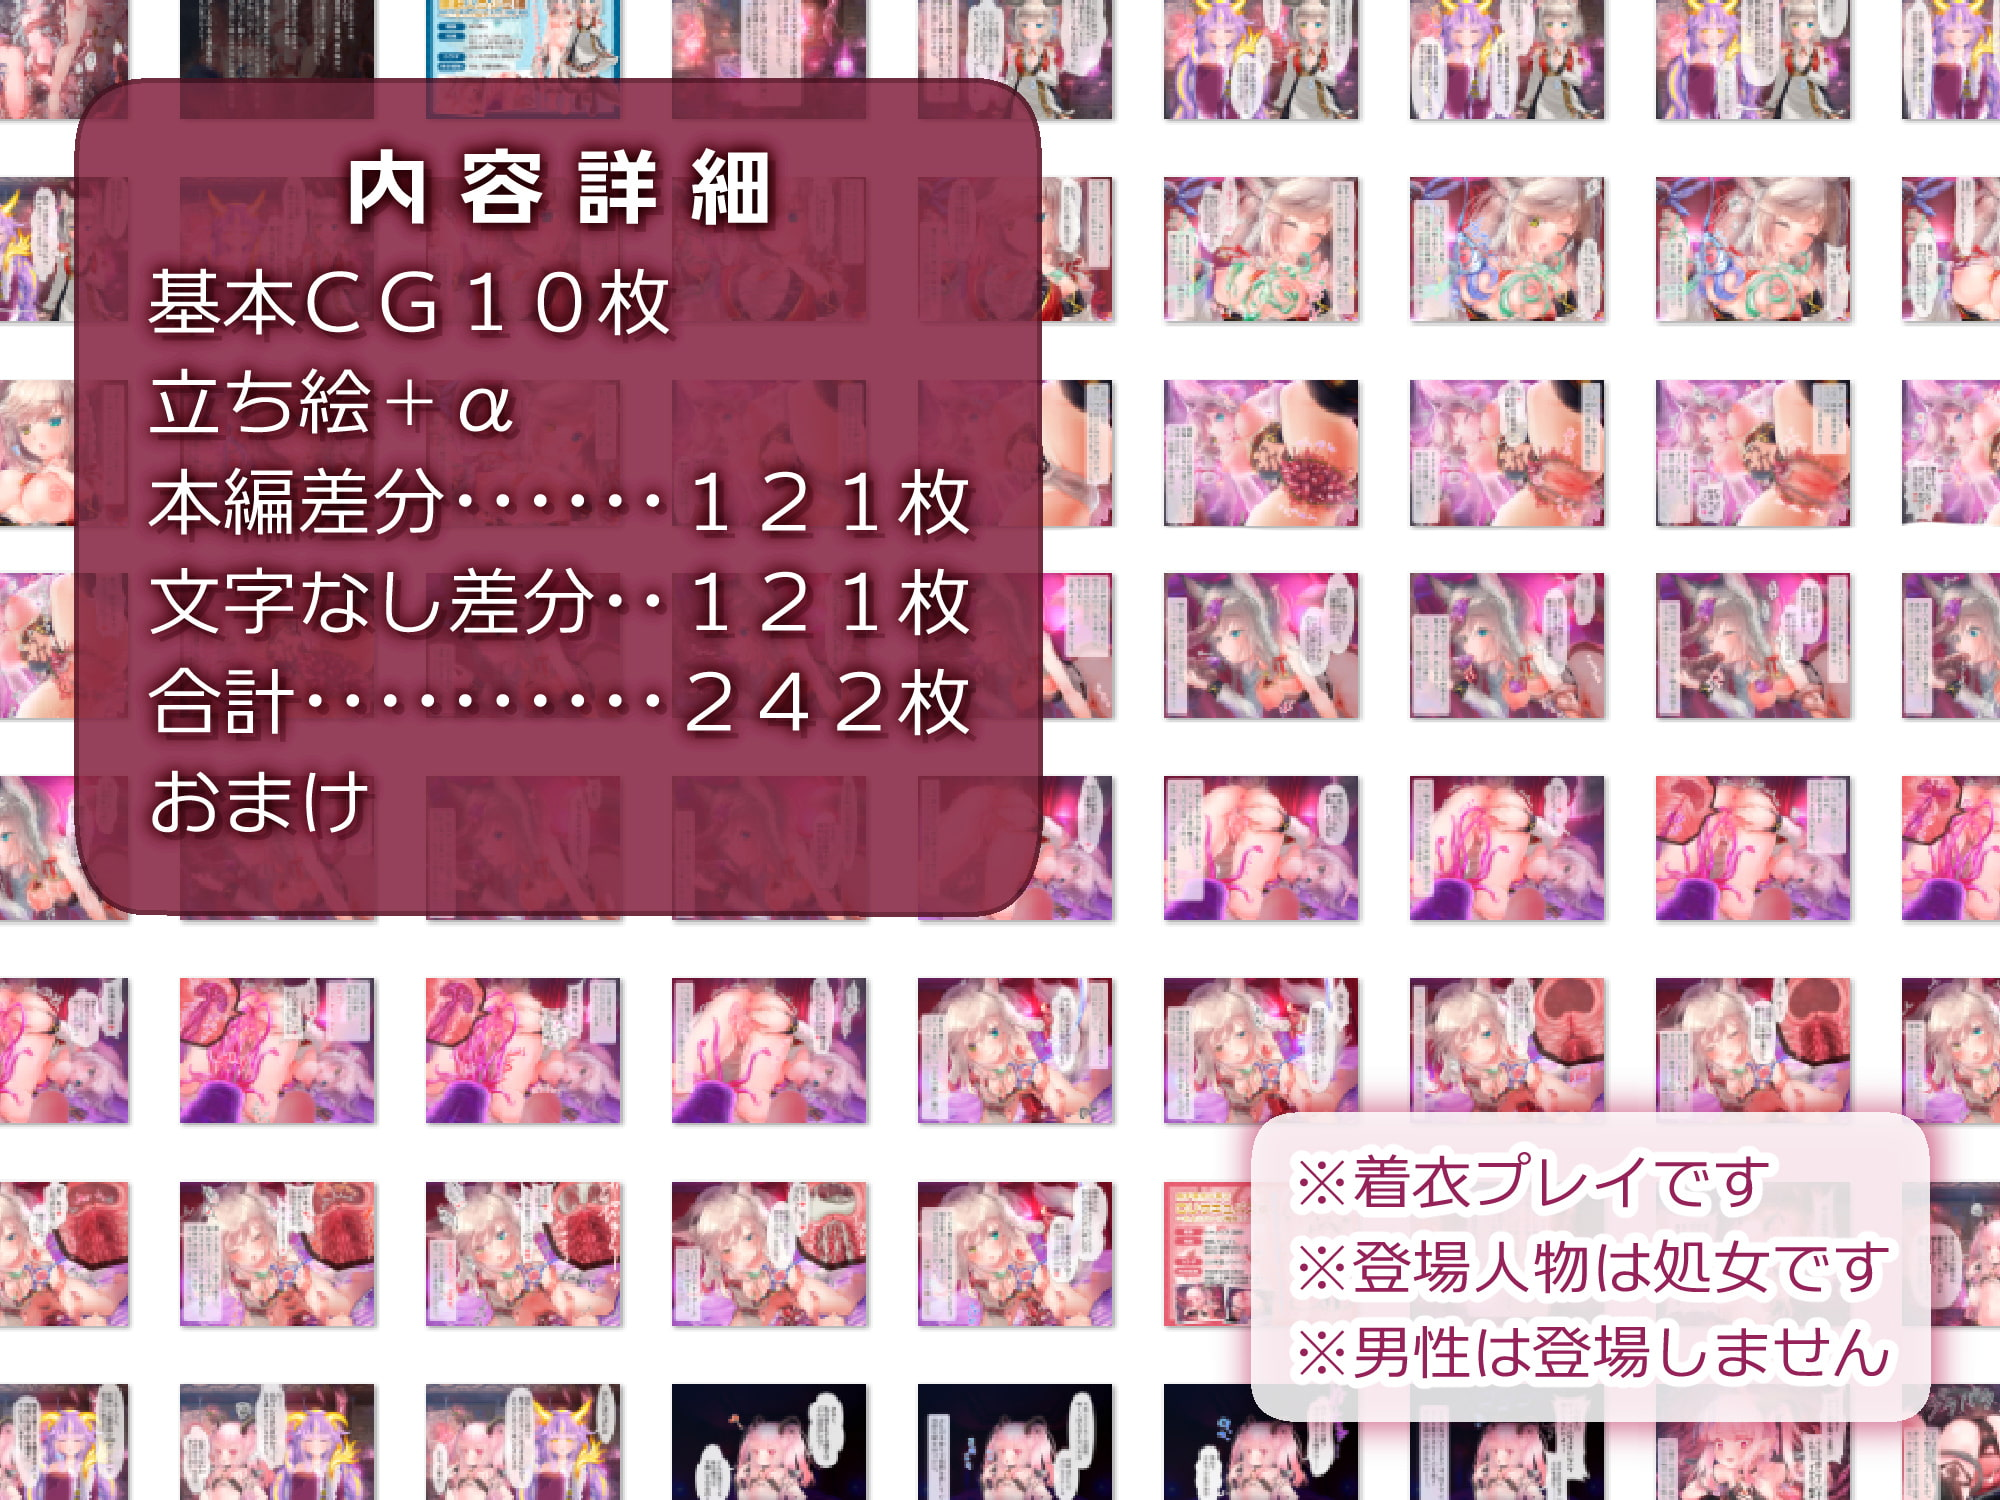 RJ322173 触手風俗 ~女性専用の触手SEX店~ [20210331]